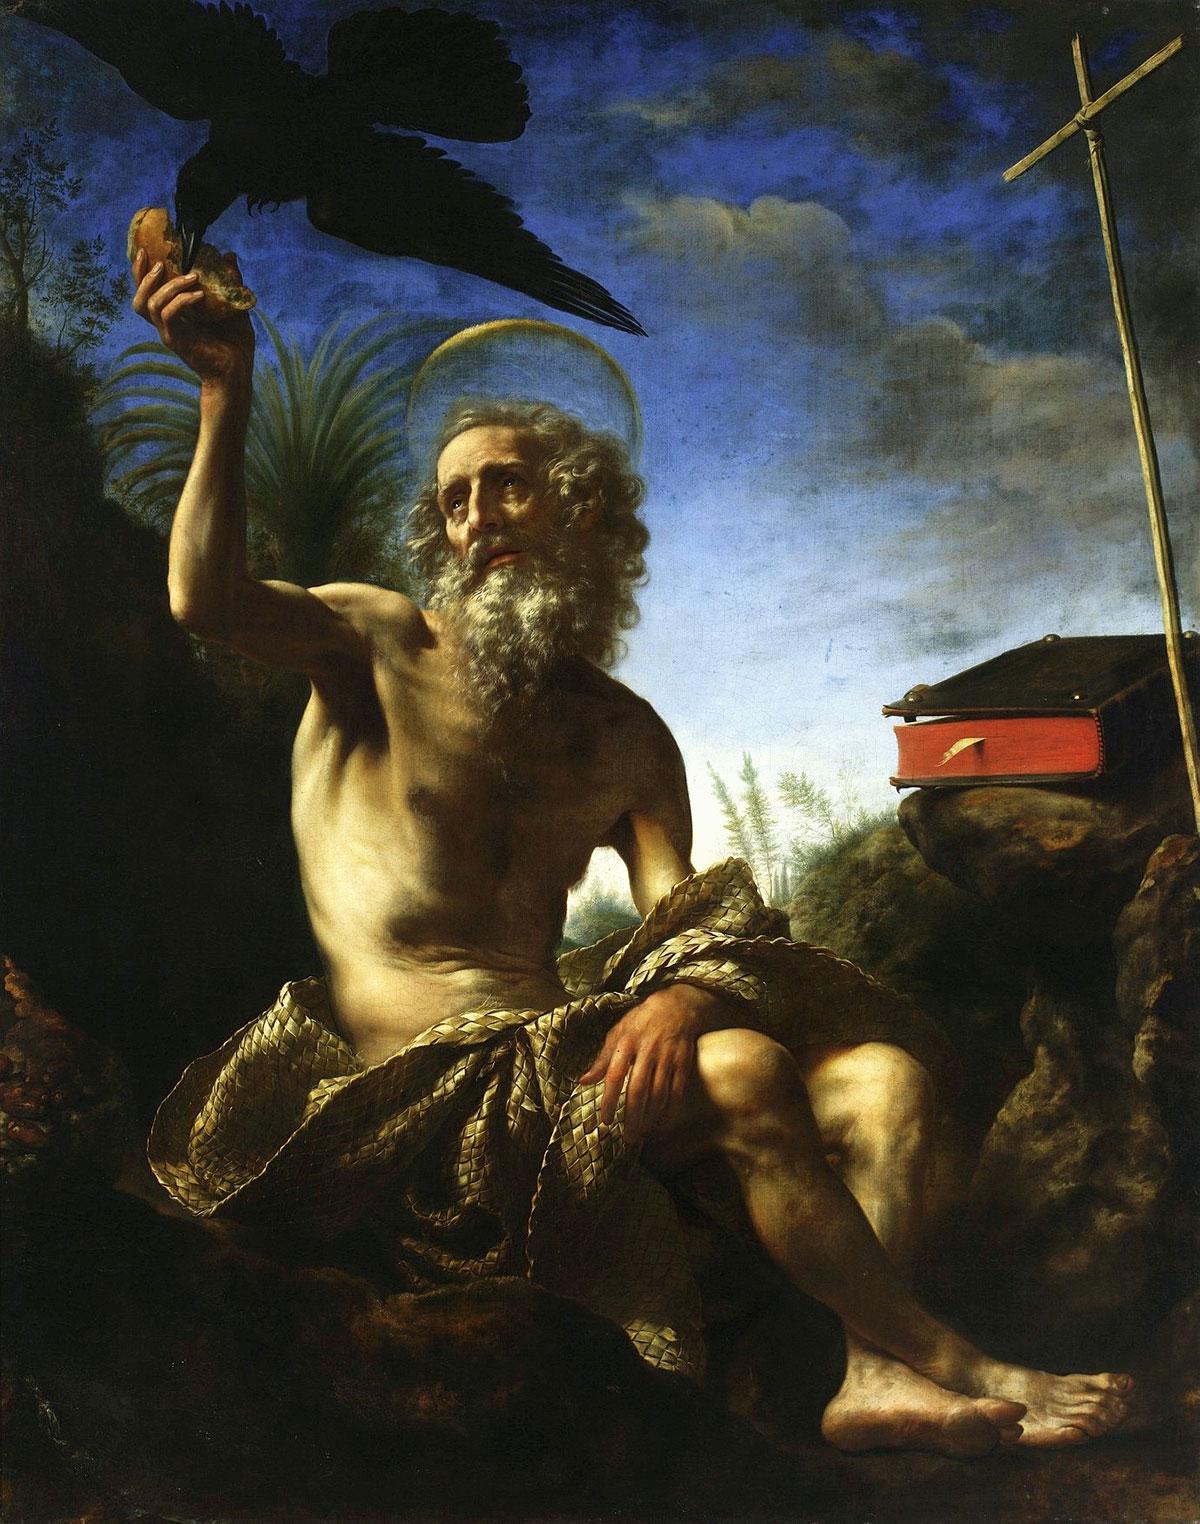 Saint Paul the hermit /San Paolo eremita/ + Dolci, Carlo *magnifico